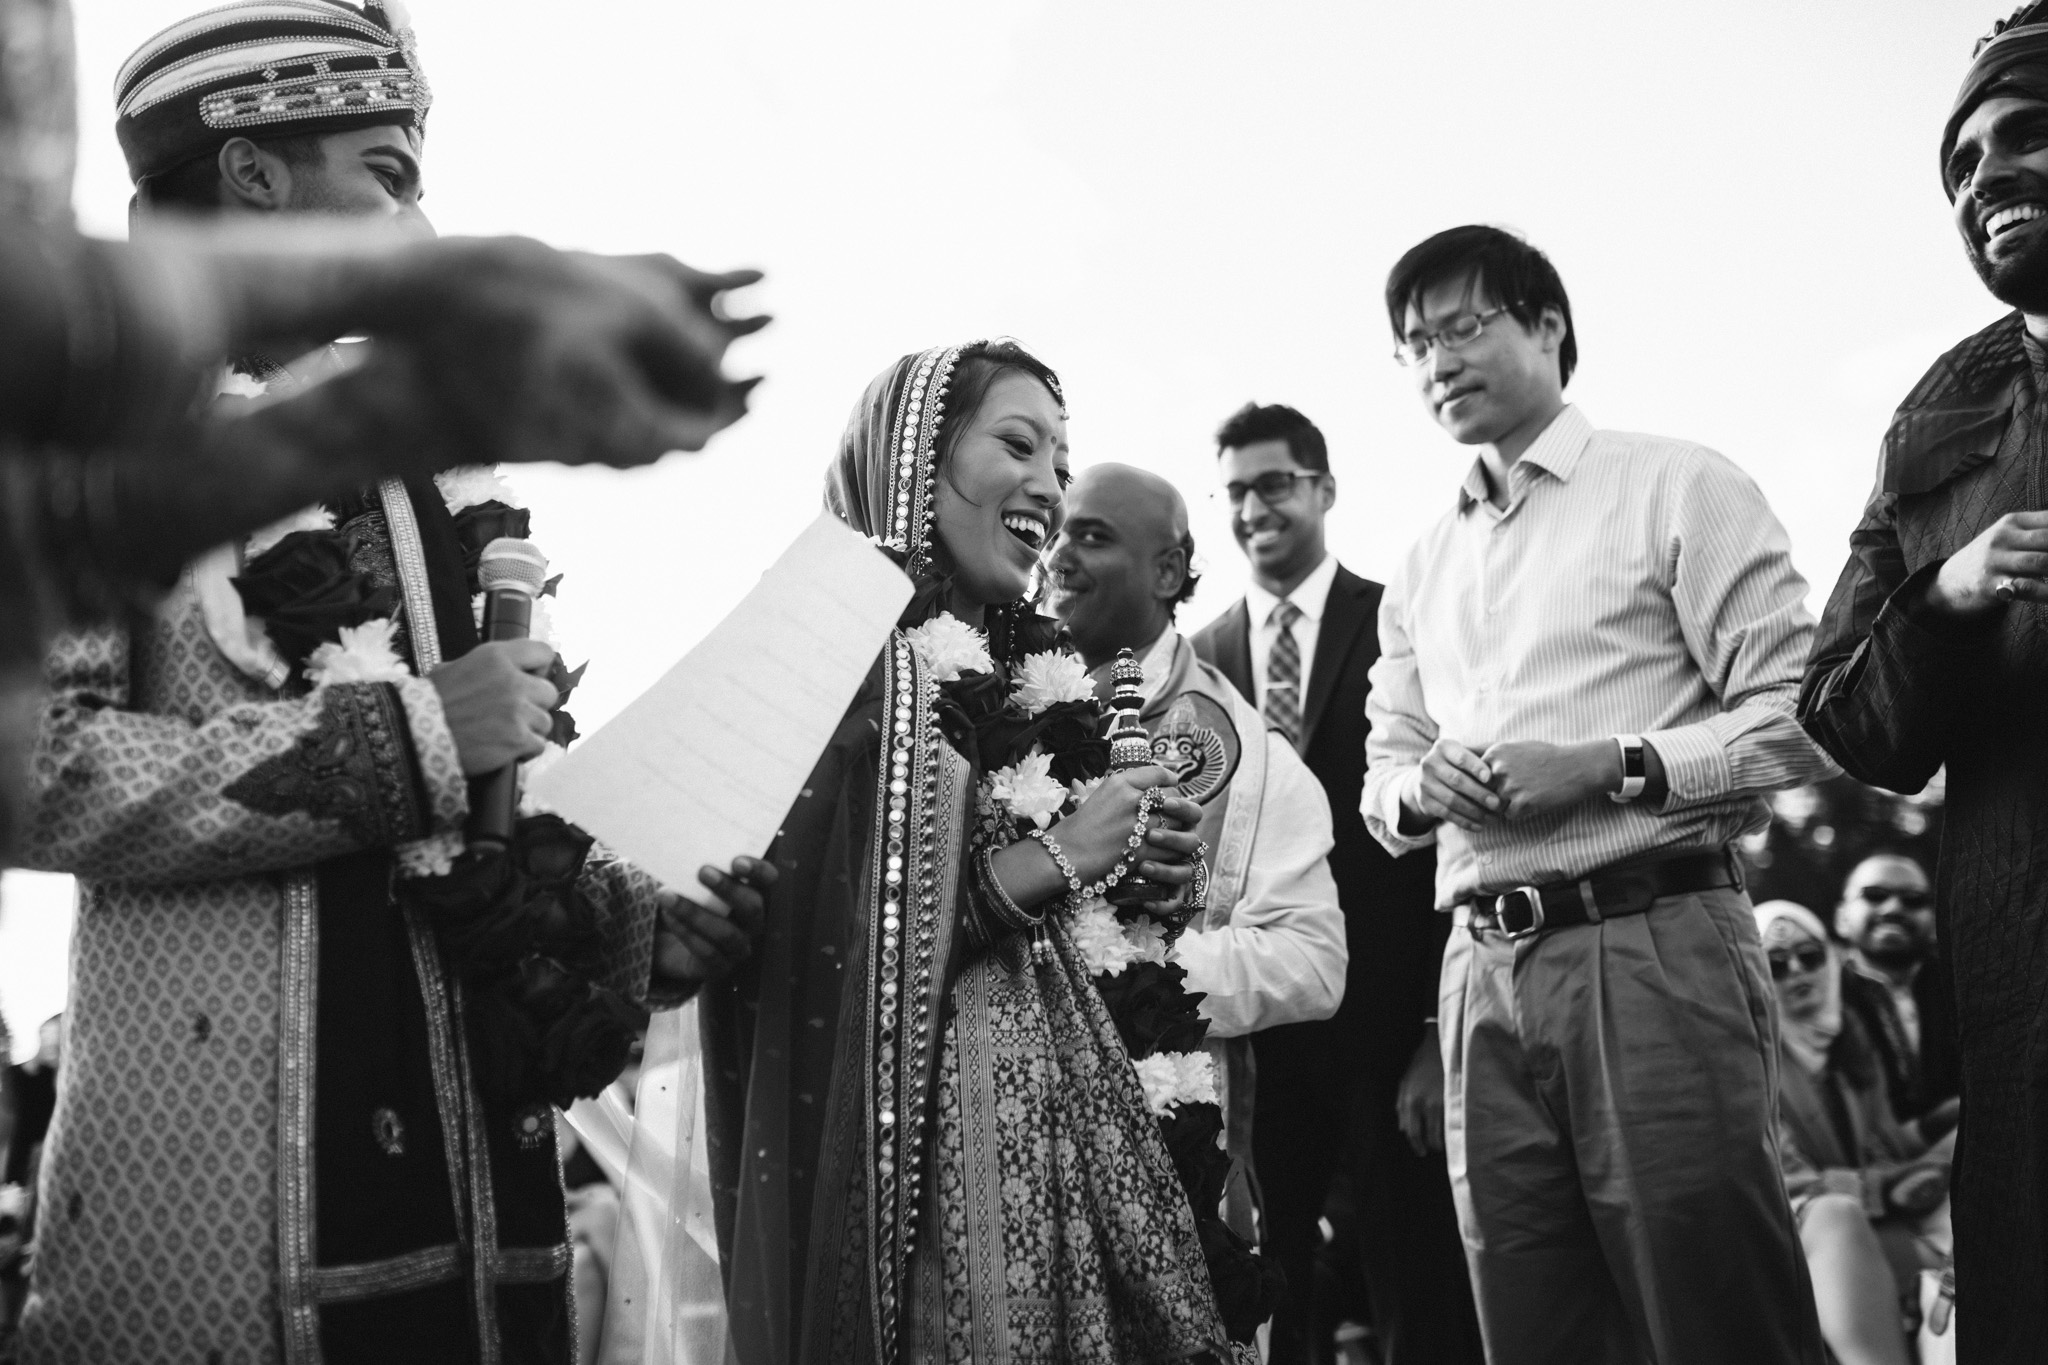 rebeccaburtphotography.hindiwedding.moraisvineyards.virginiawedding-140.JPG